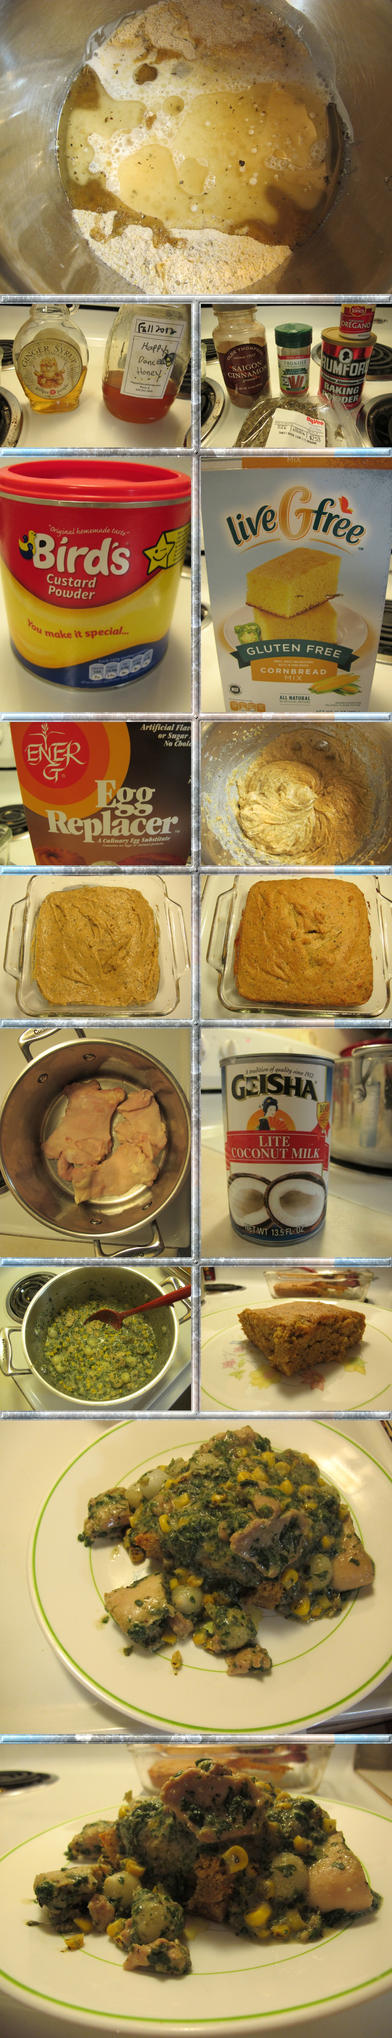 Creamy Chicken over Savory Gluten-Free Cornbread by Windthin